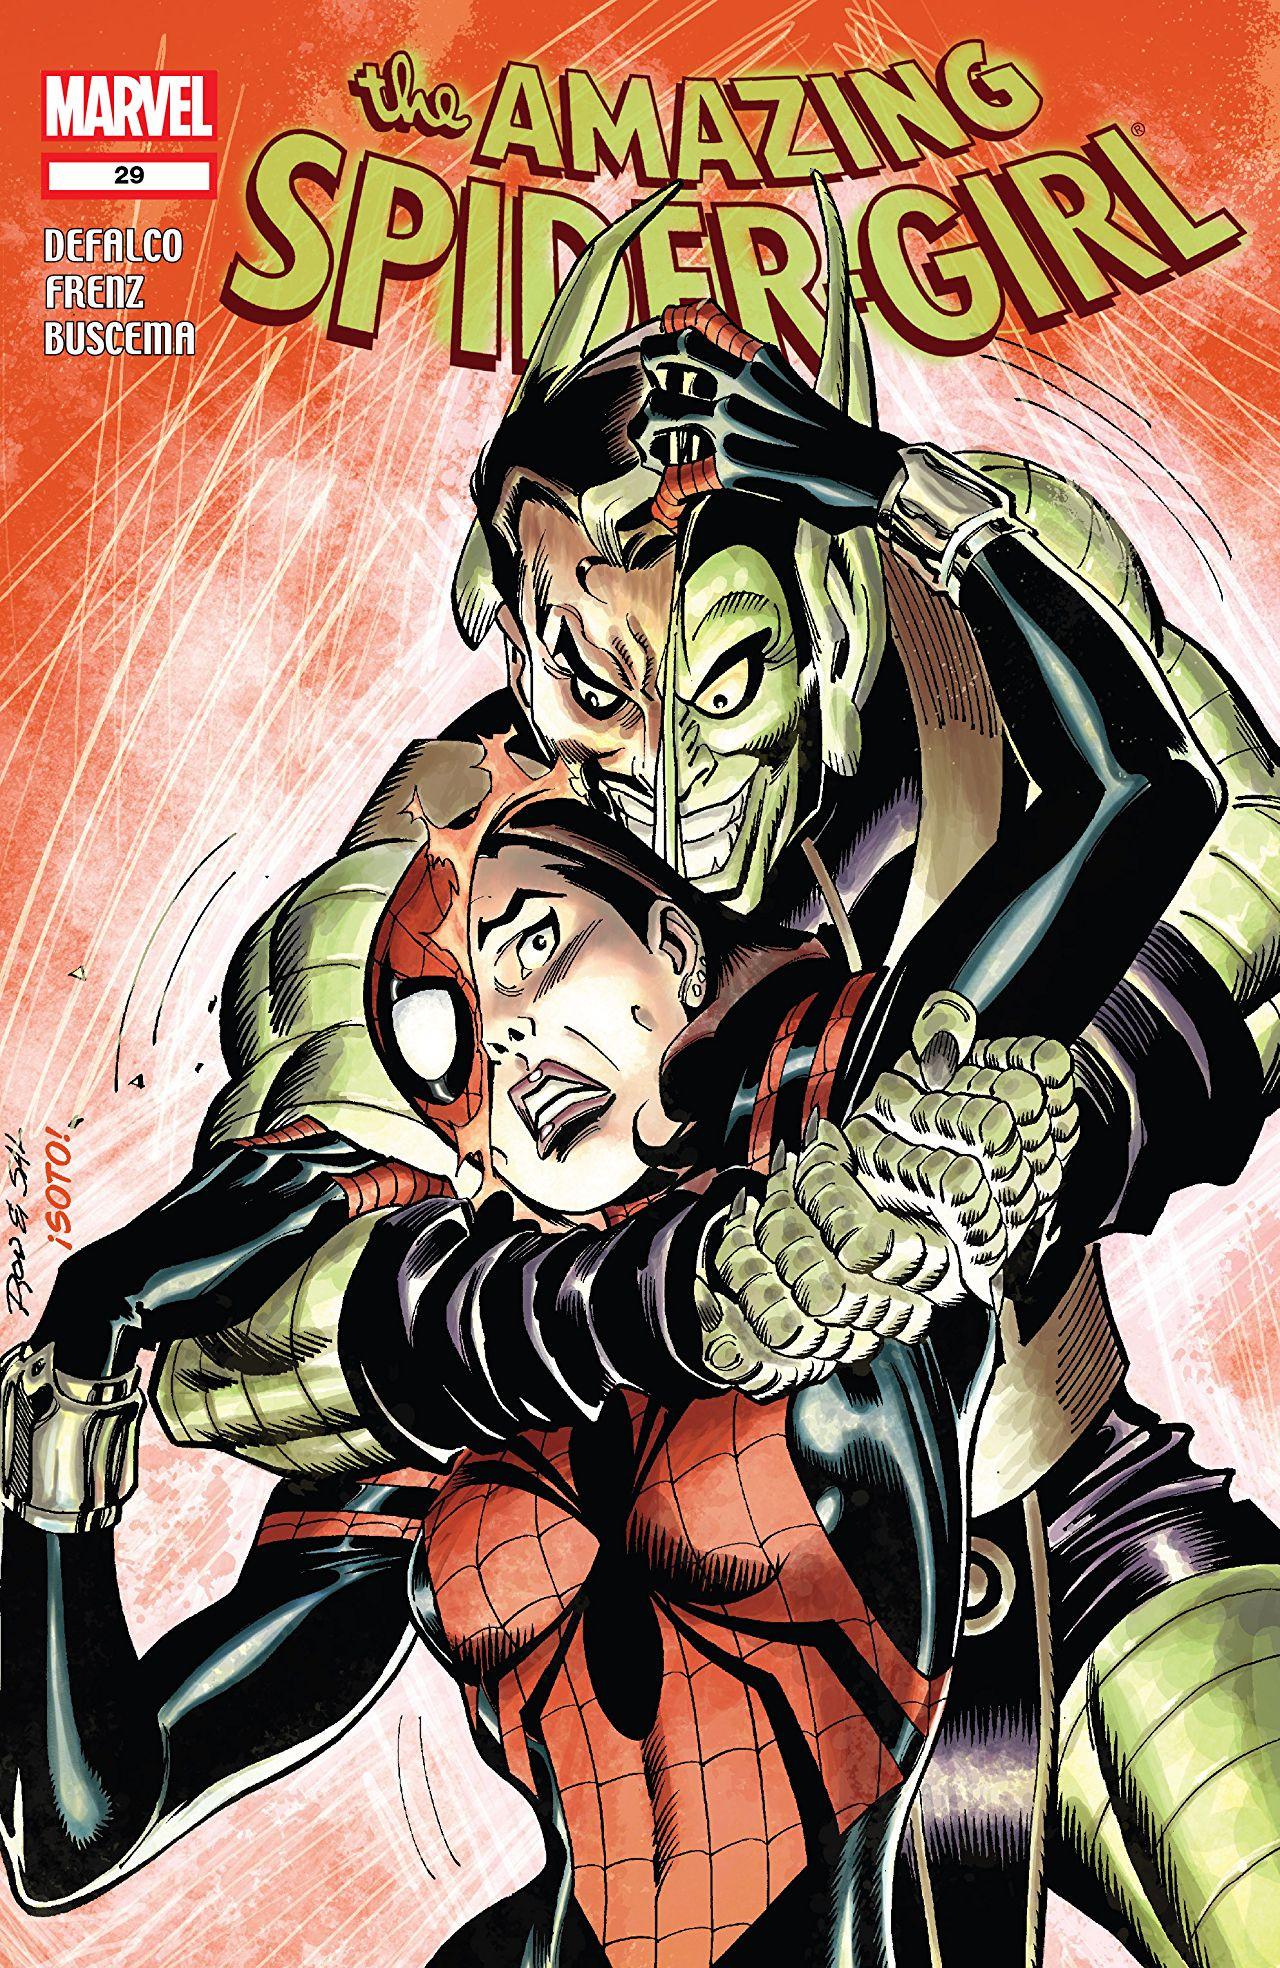 Amazing Spider-Girl Vol 1 29